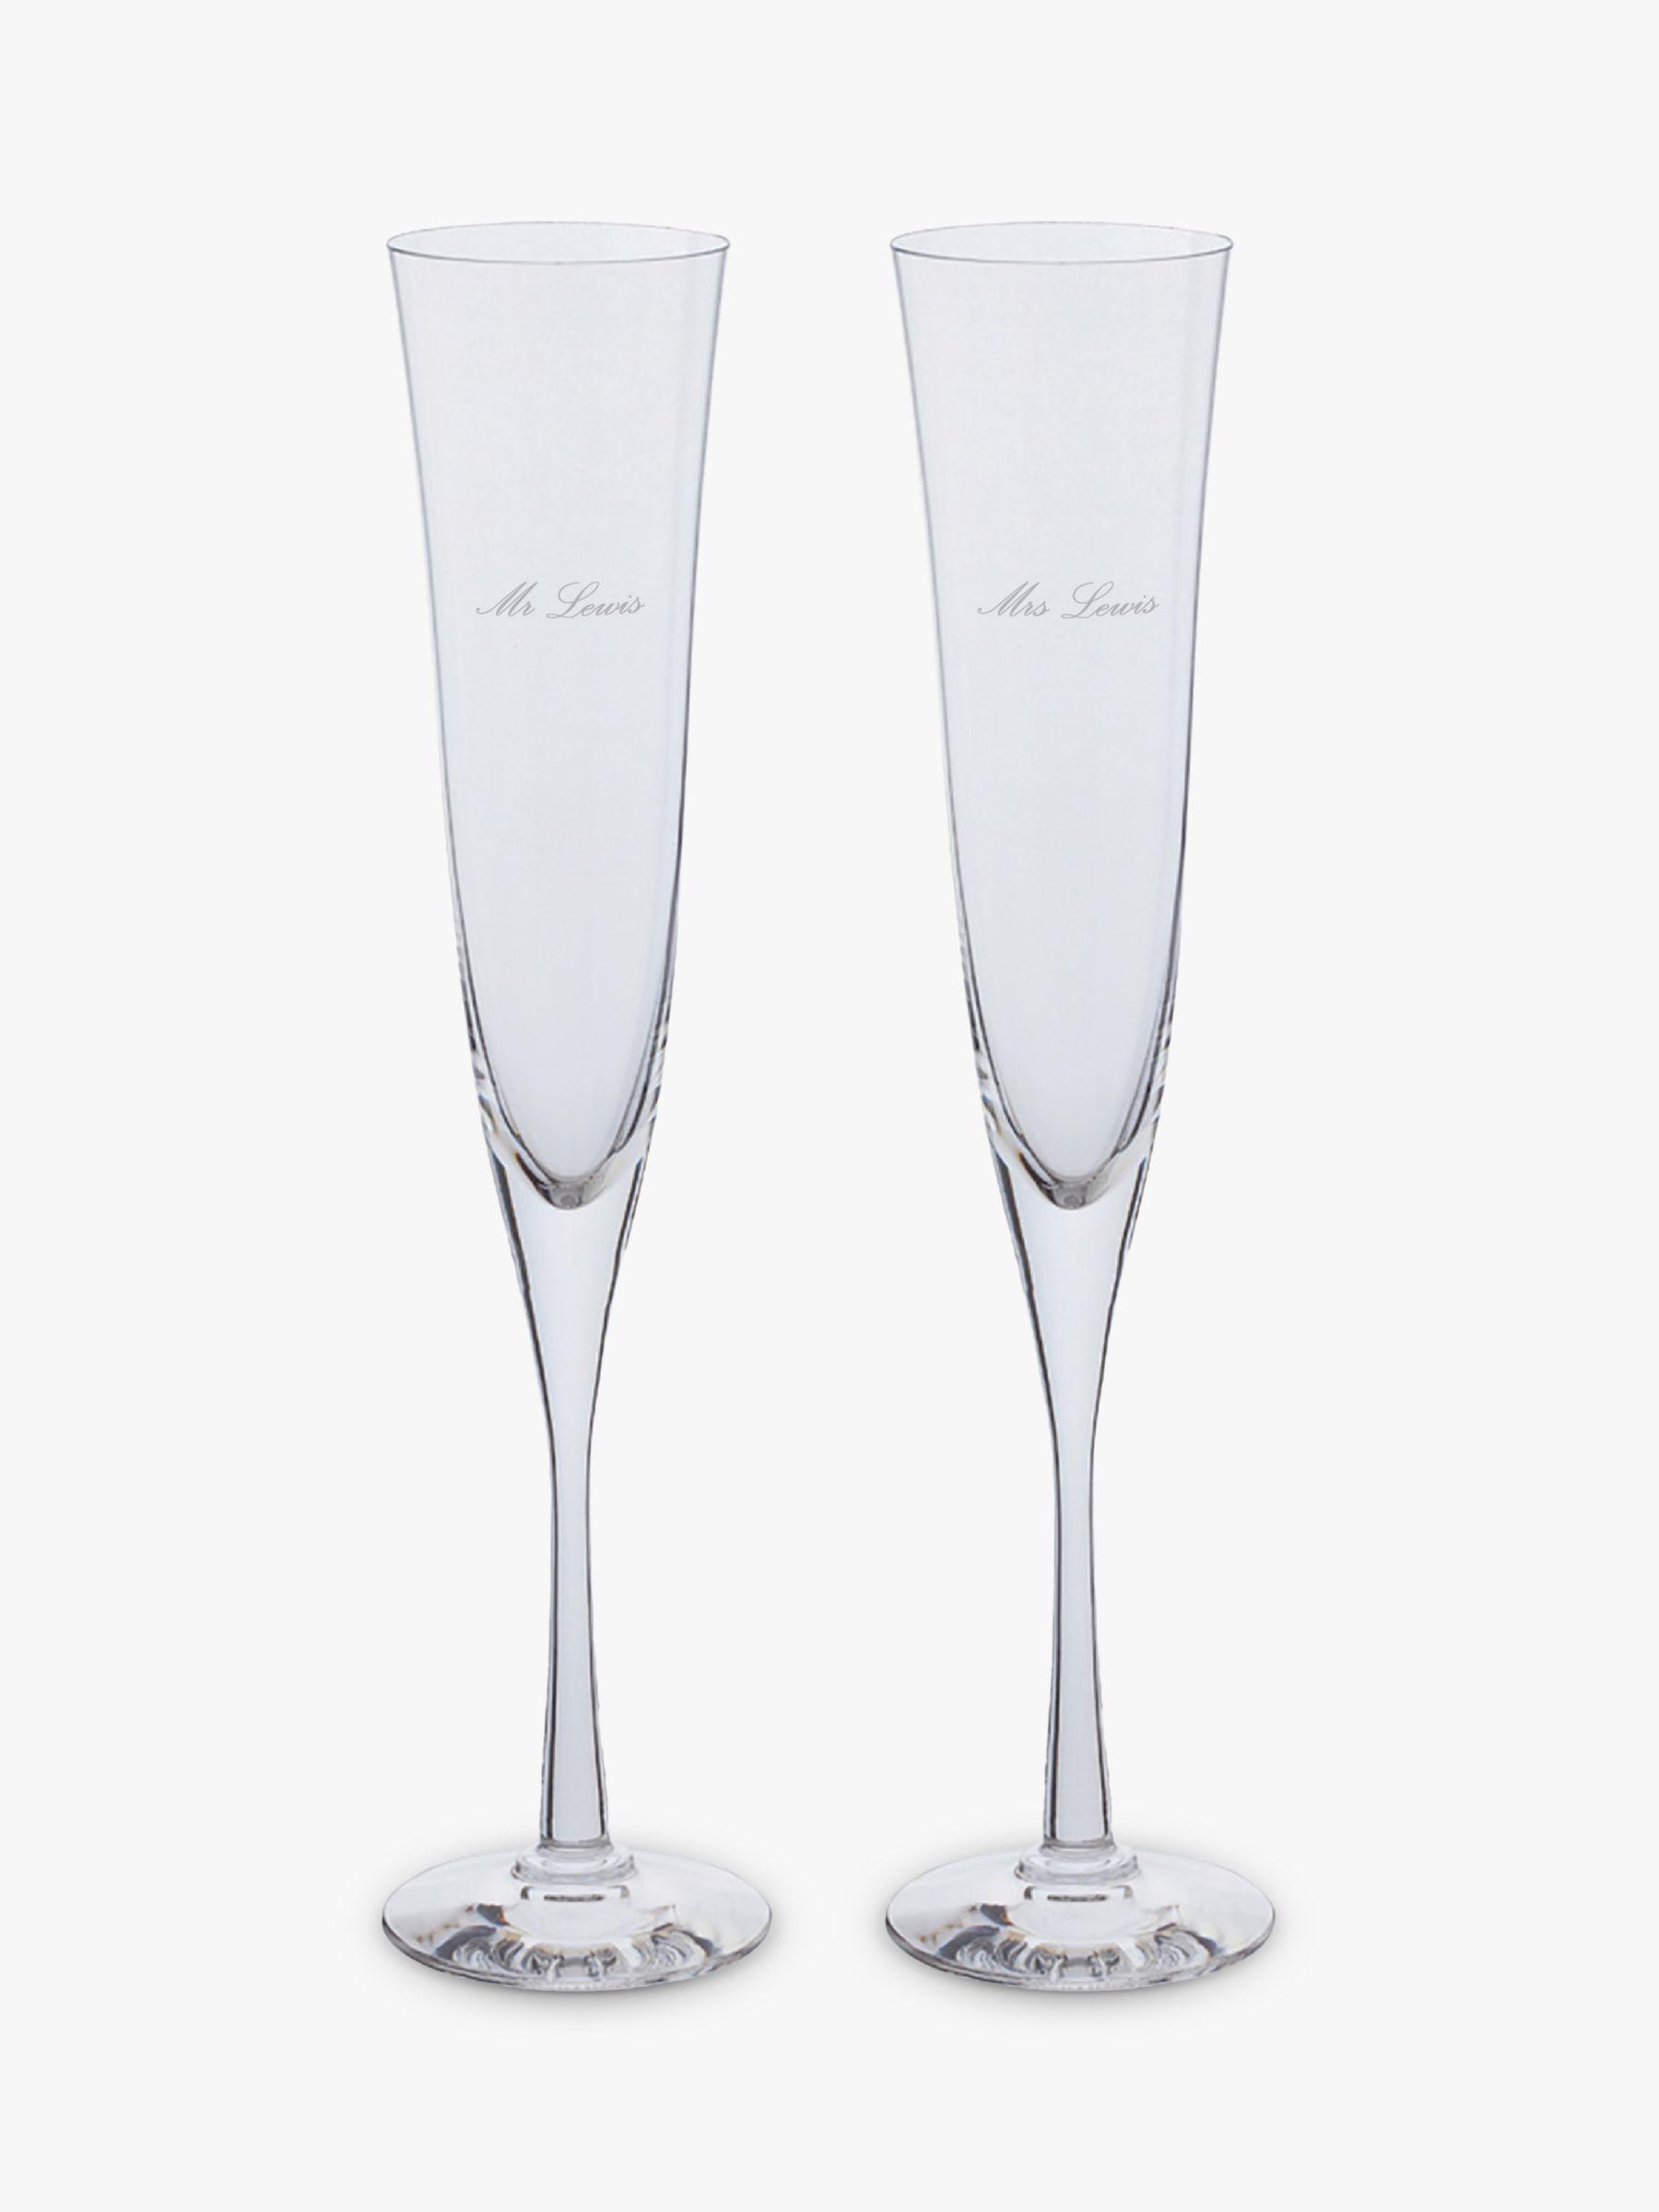 Dartington Crystal Dartington Crystal Personalised Celebration Flutes, 150ml, Set of 2, Palace Script Font